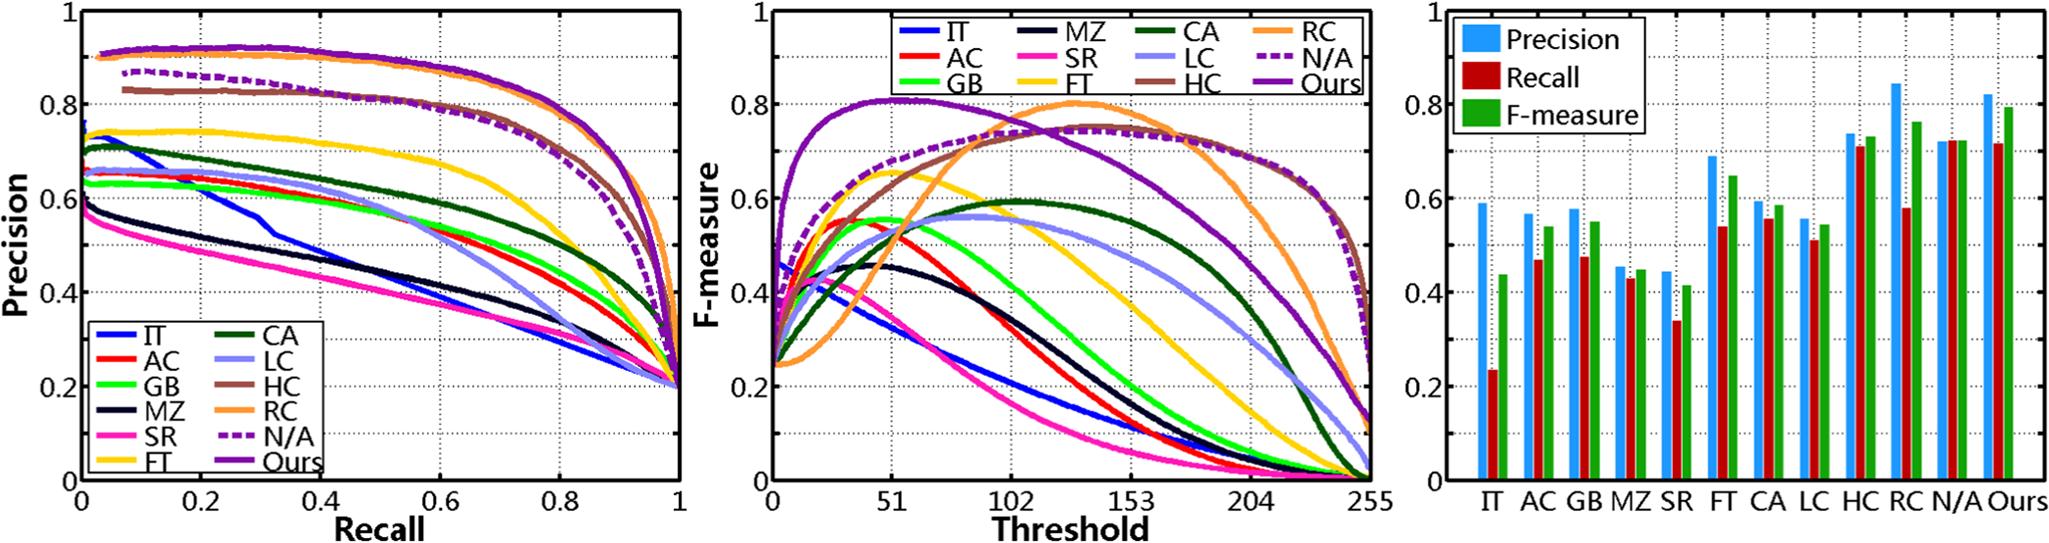 Regional Principal Color Based Saliency Detection - Figure 8